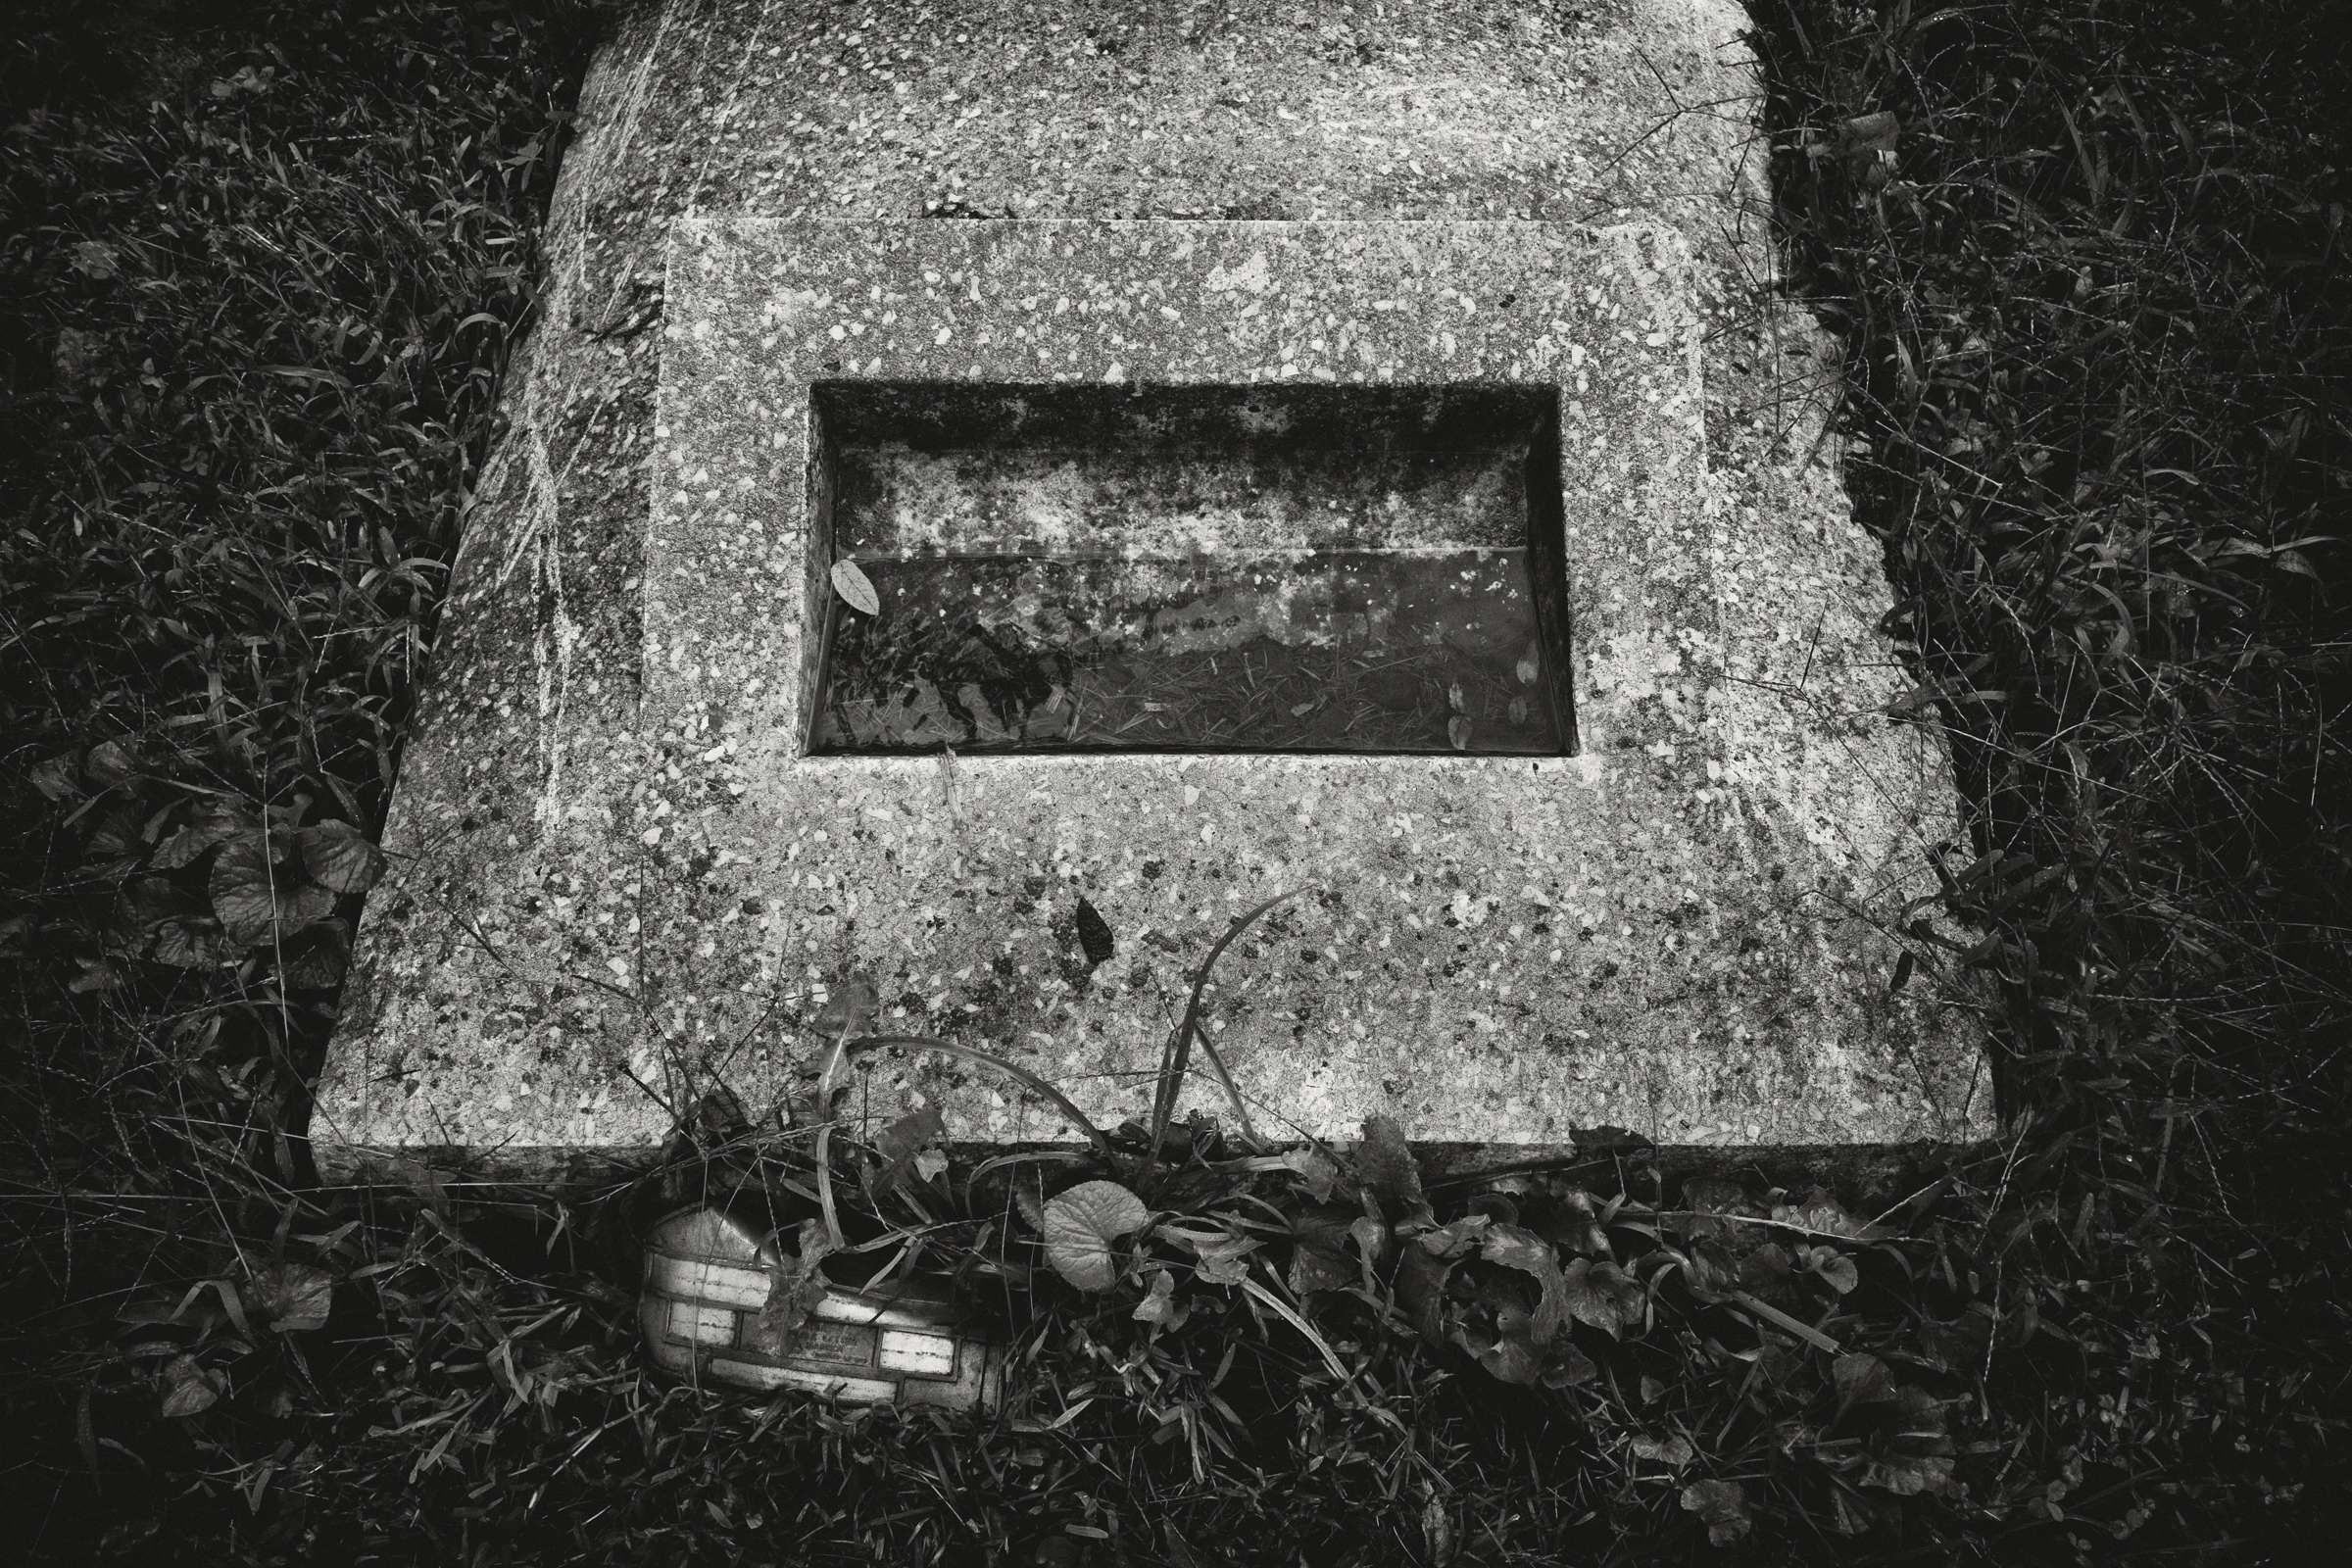 Tesson Cemetery, Kansas, 2018